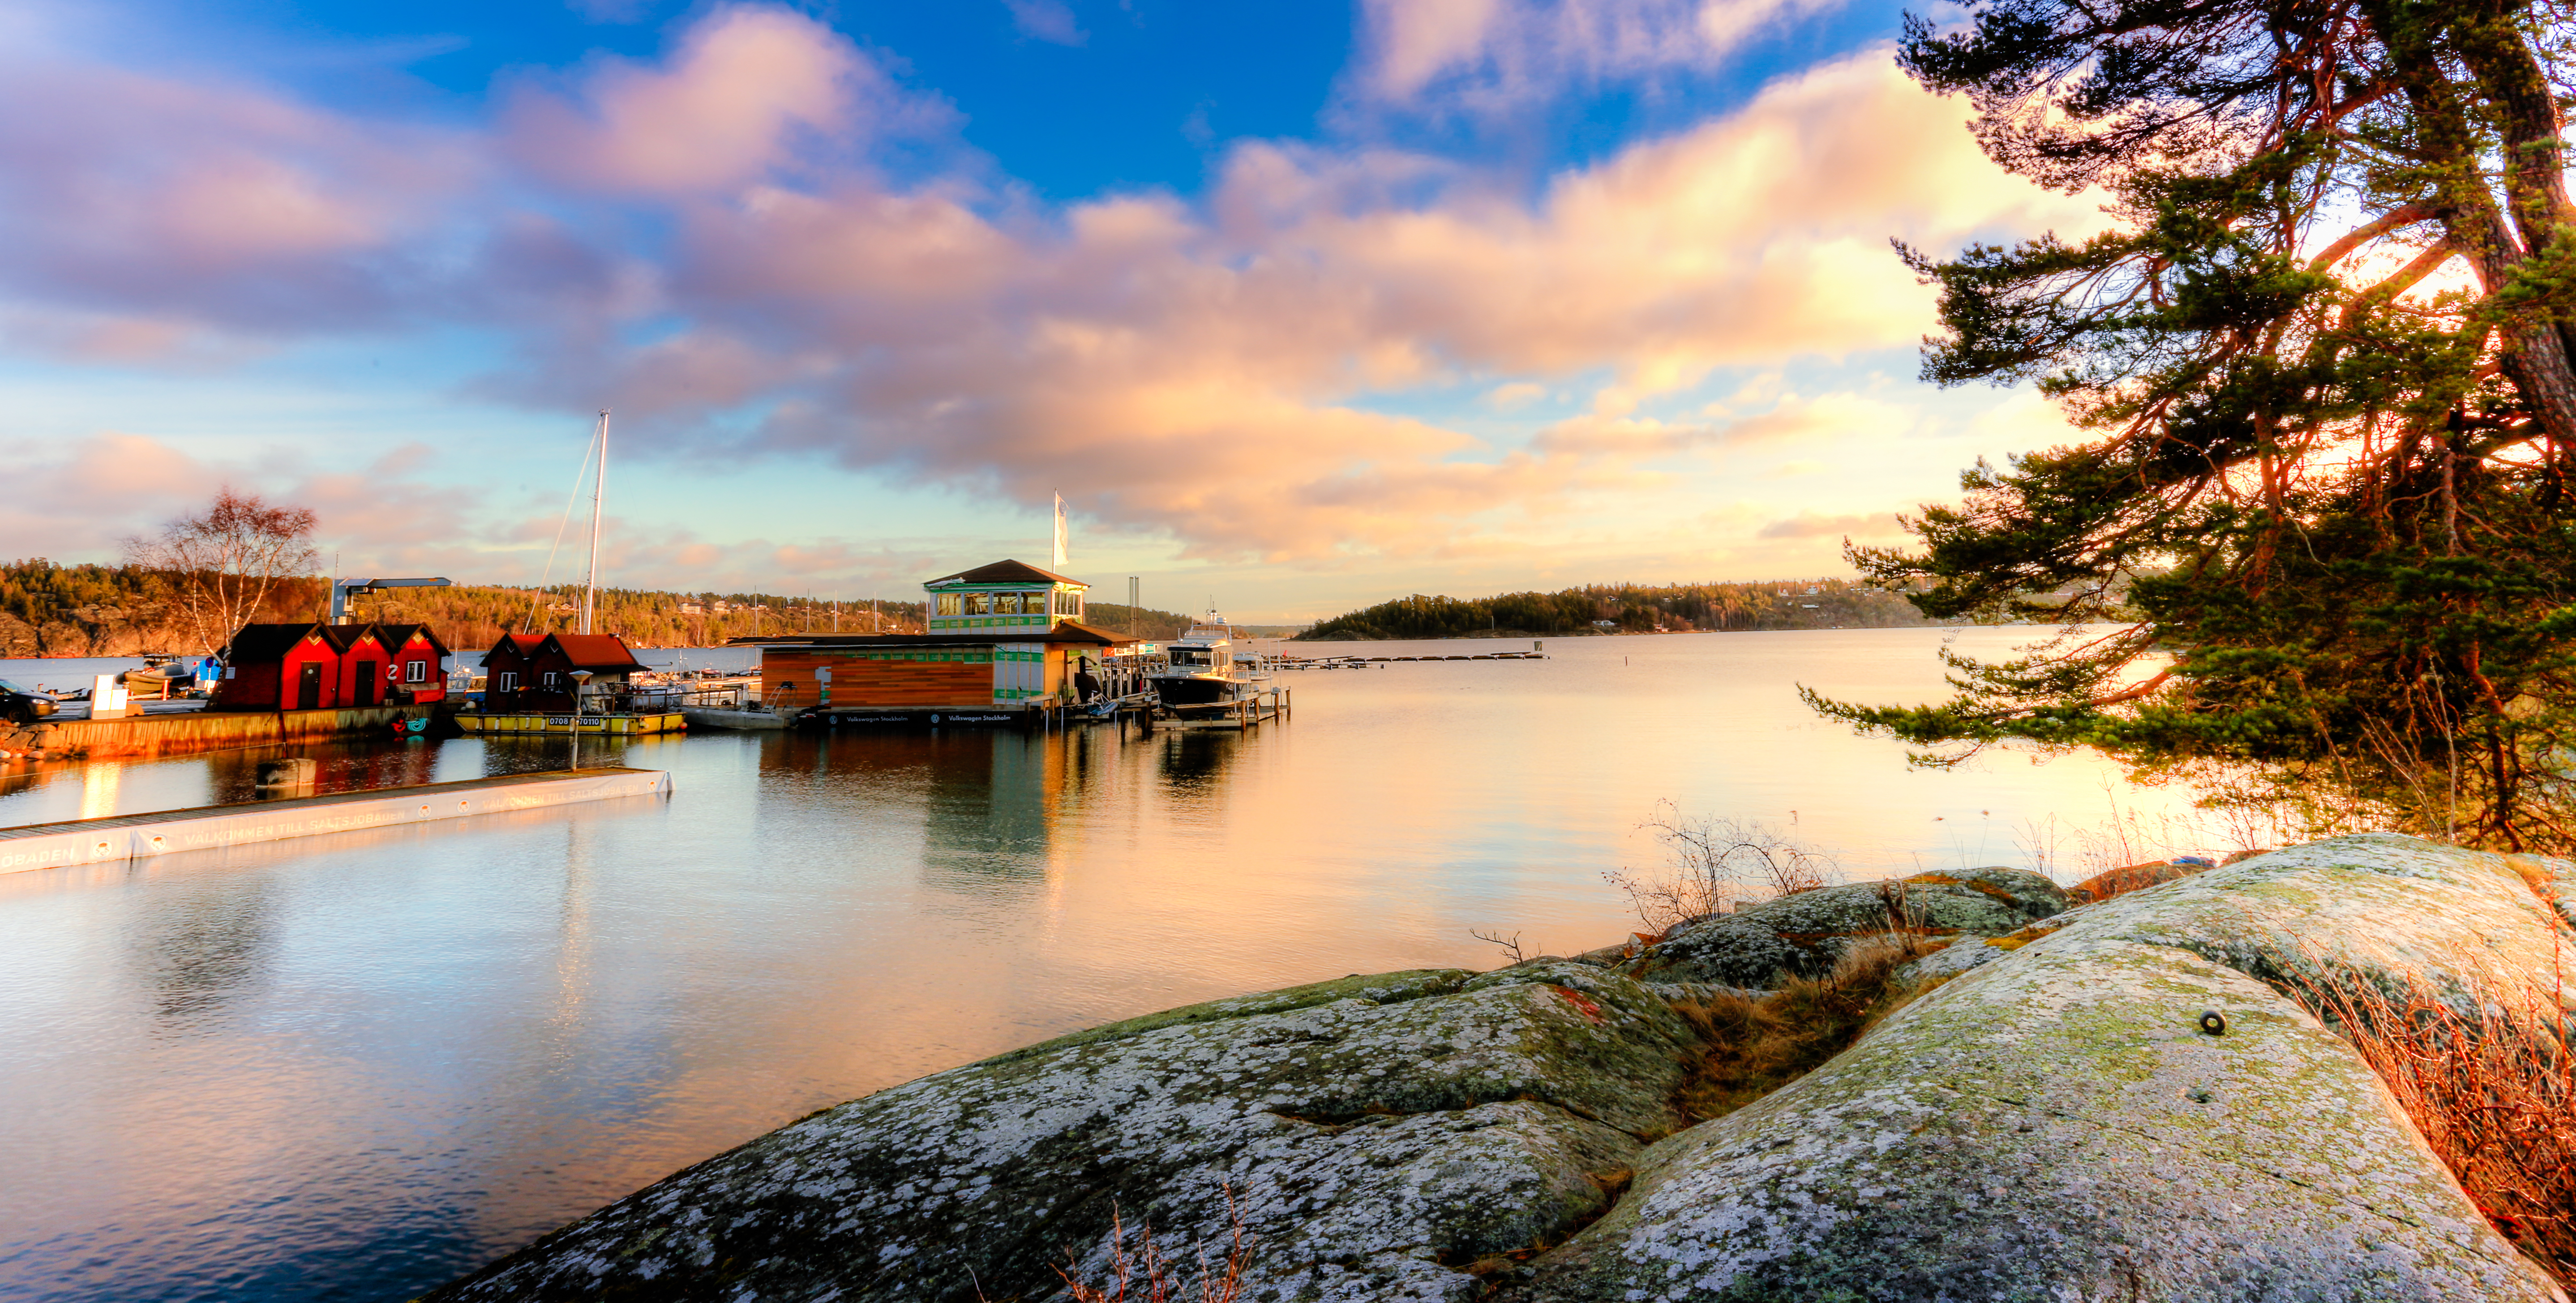 Saltjöbaden Saltsäcken lake